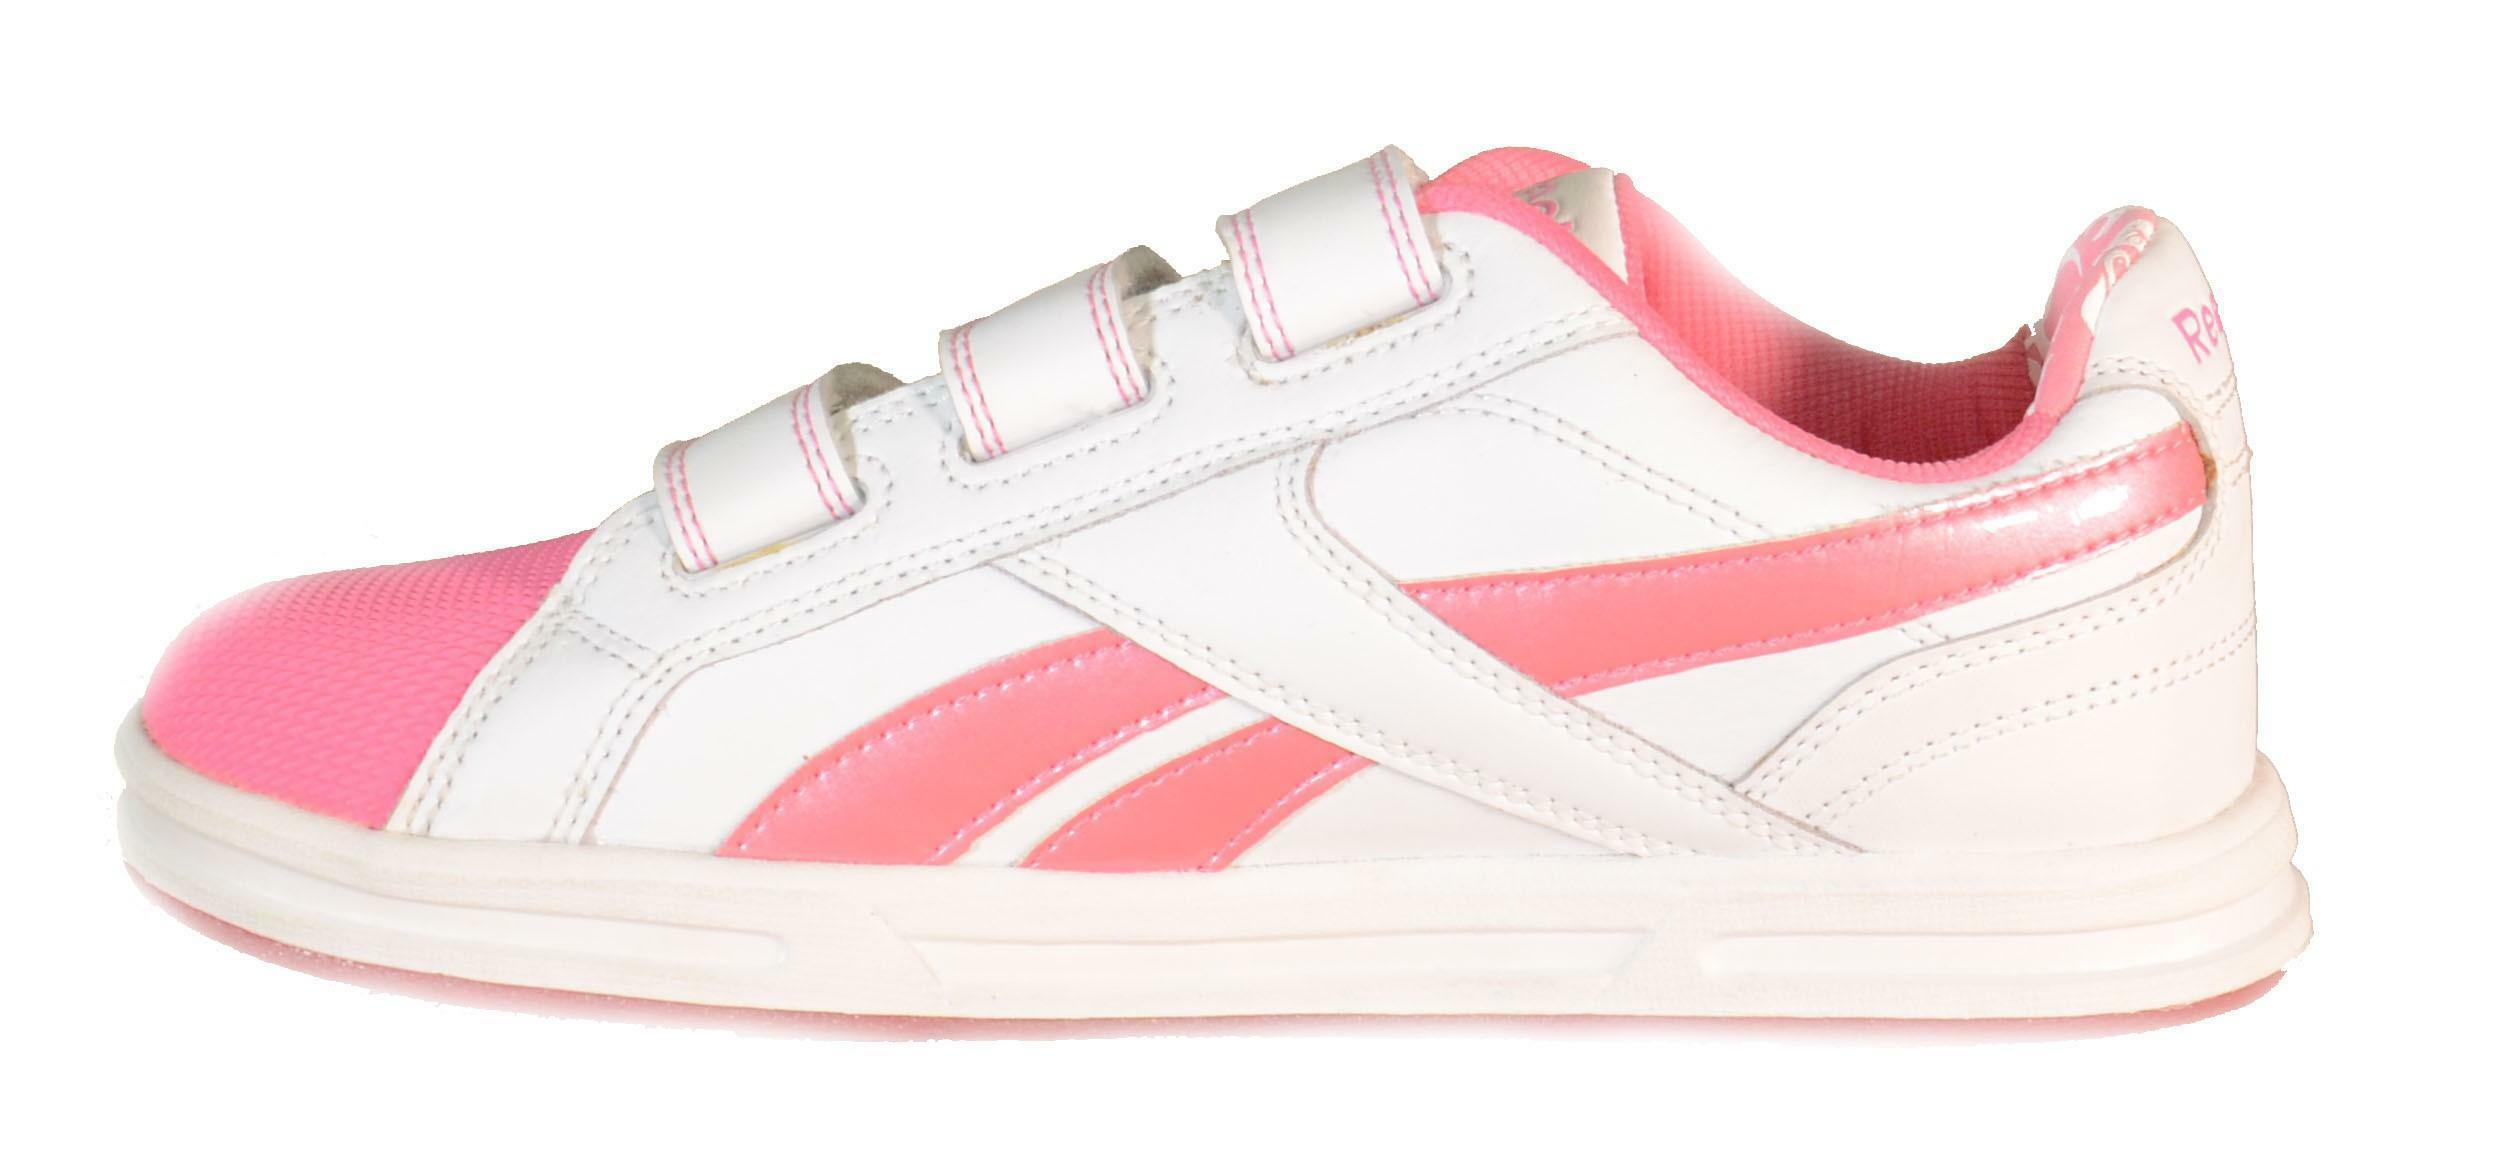 reebok reebok ace it kc scarpe sportive donna bianche pelle tela strappi j19461